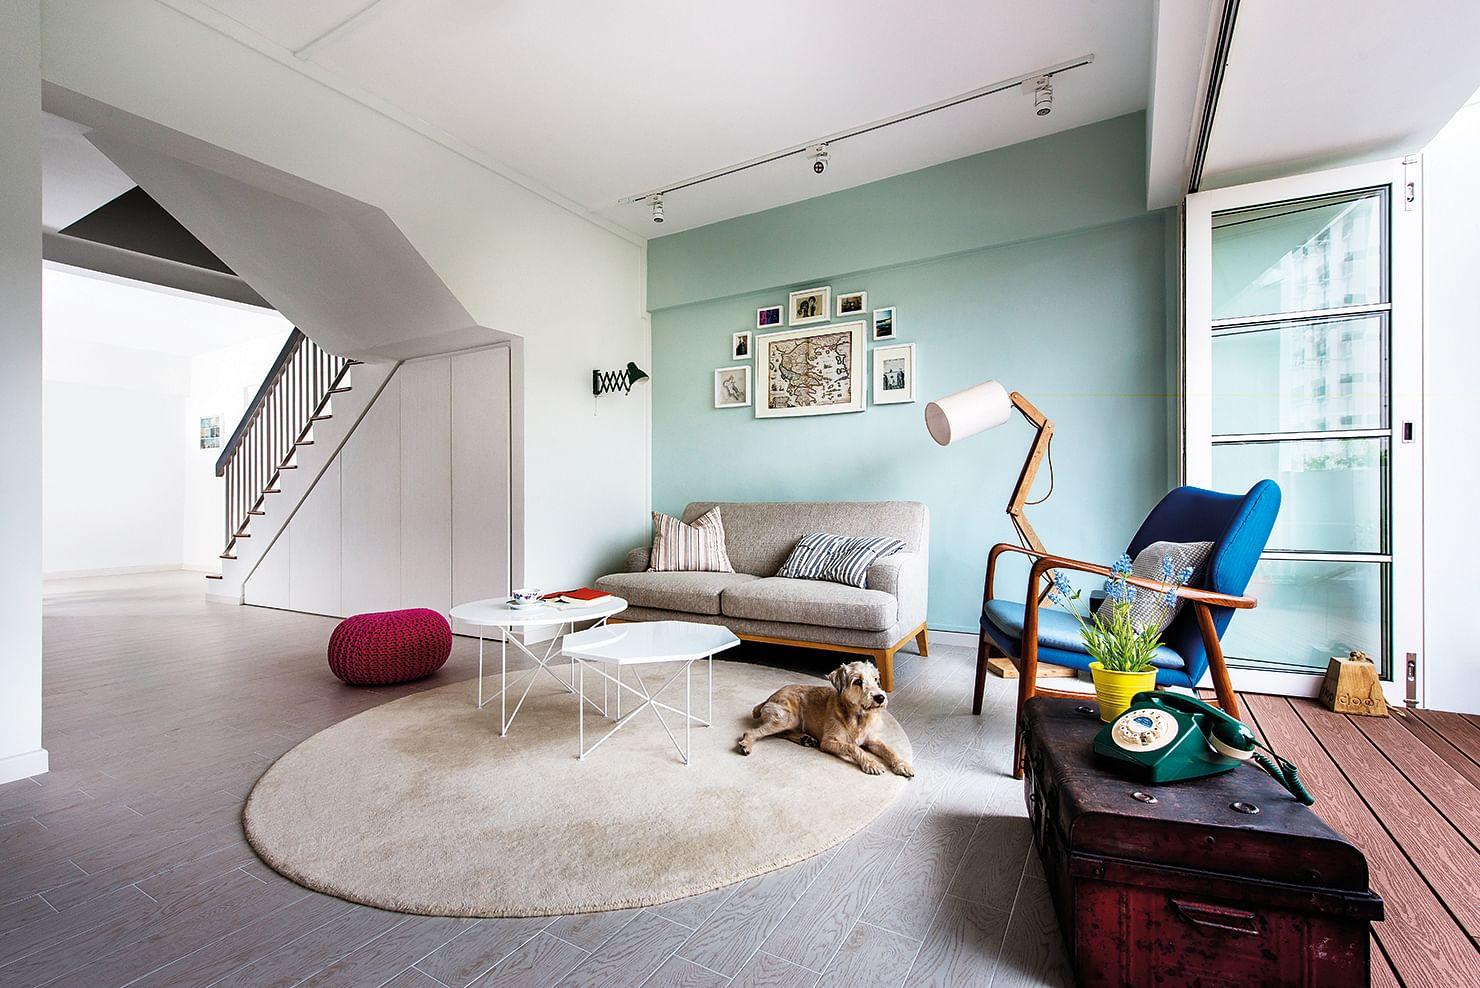 Iniche Designs Interior 5 Room Best Free Home Design